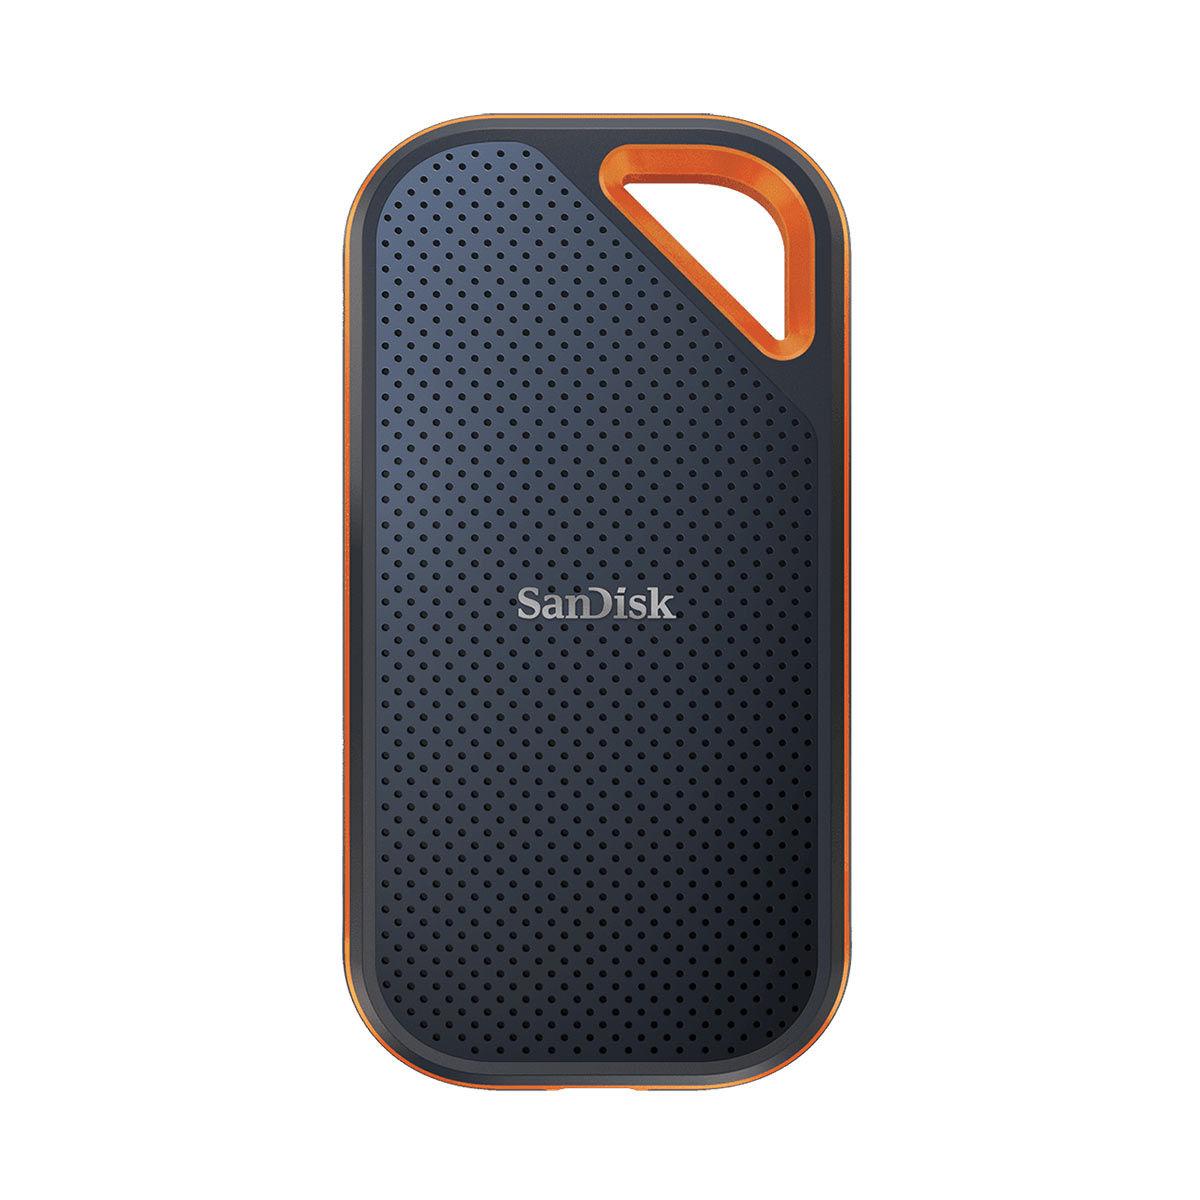 SanDisk Extreme PRO Portable SSD V2 1TB